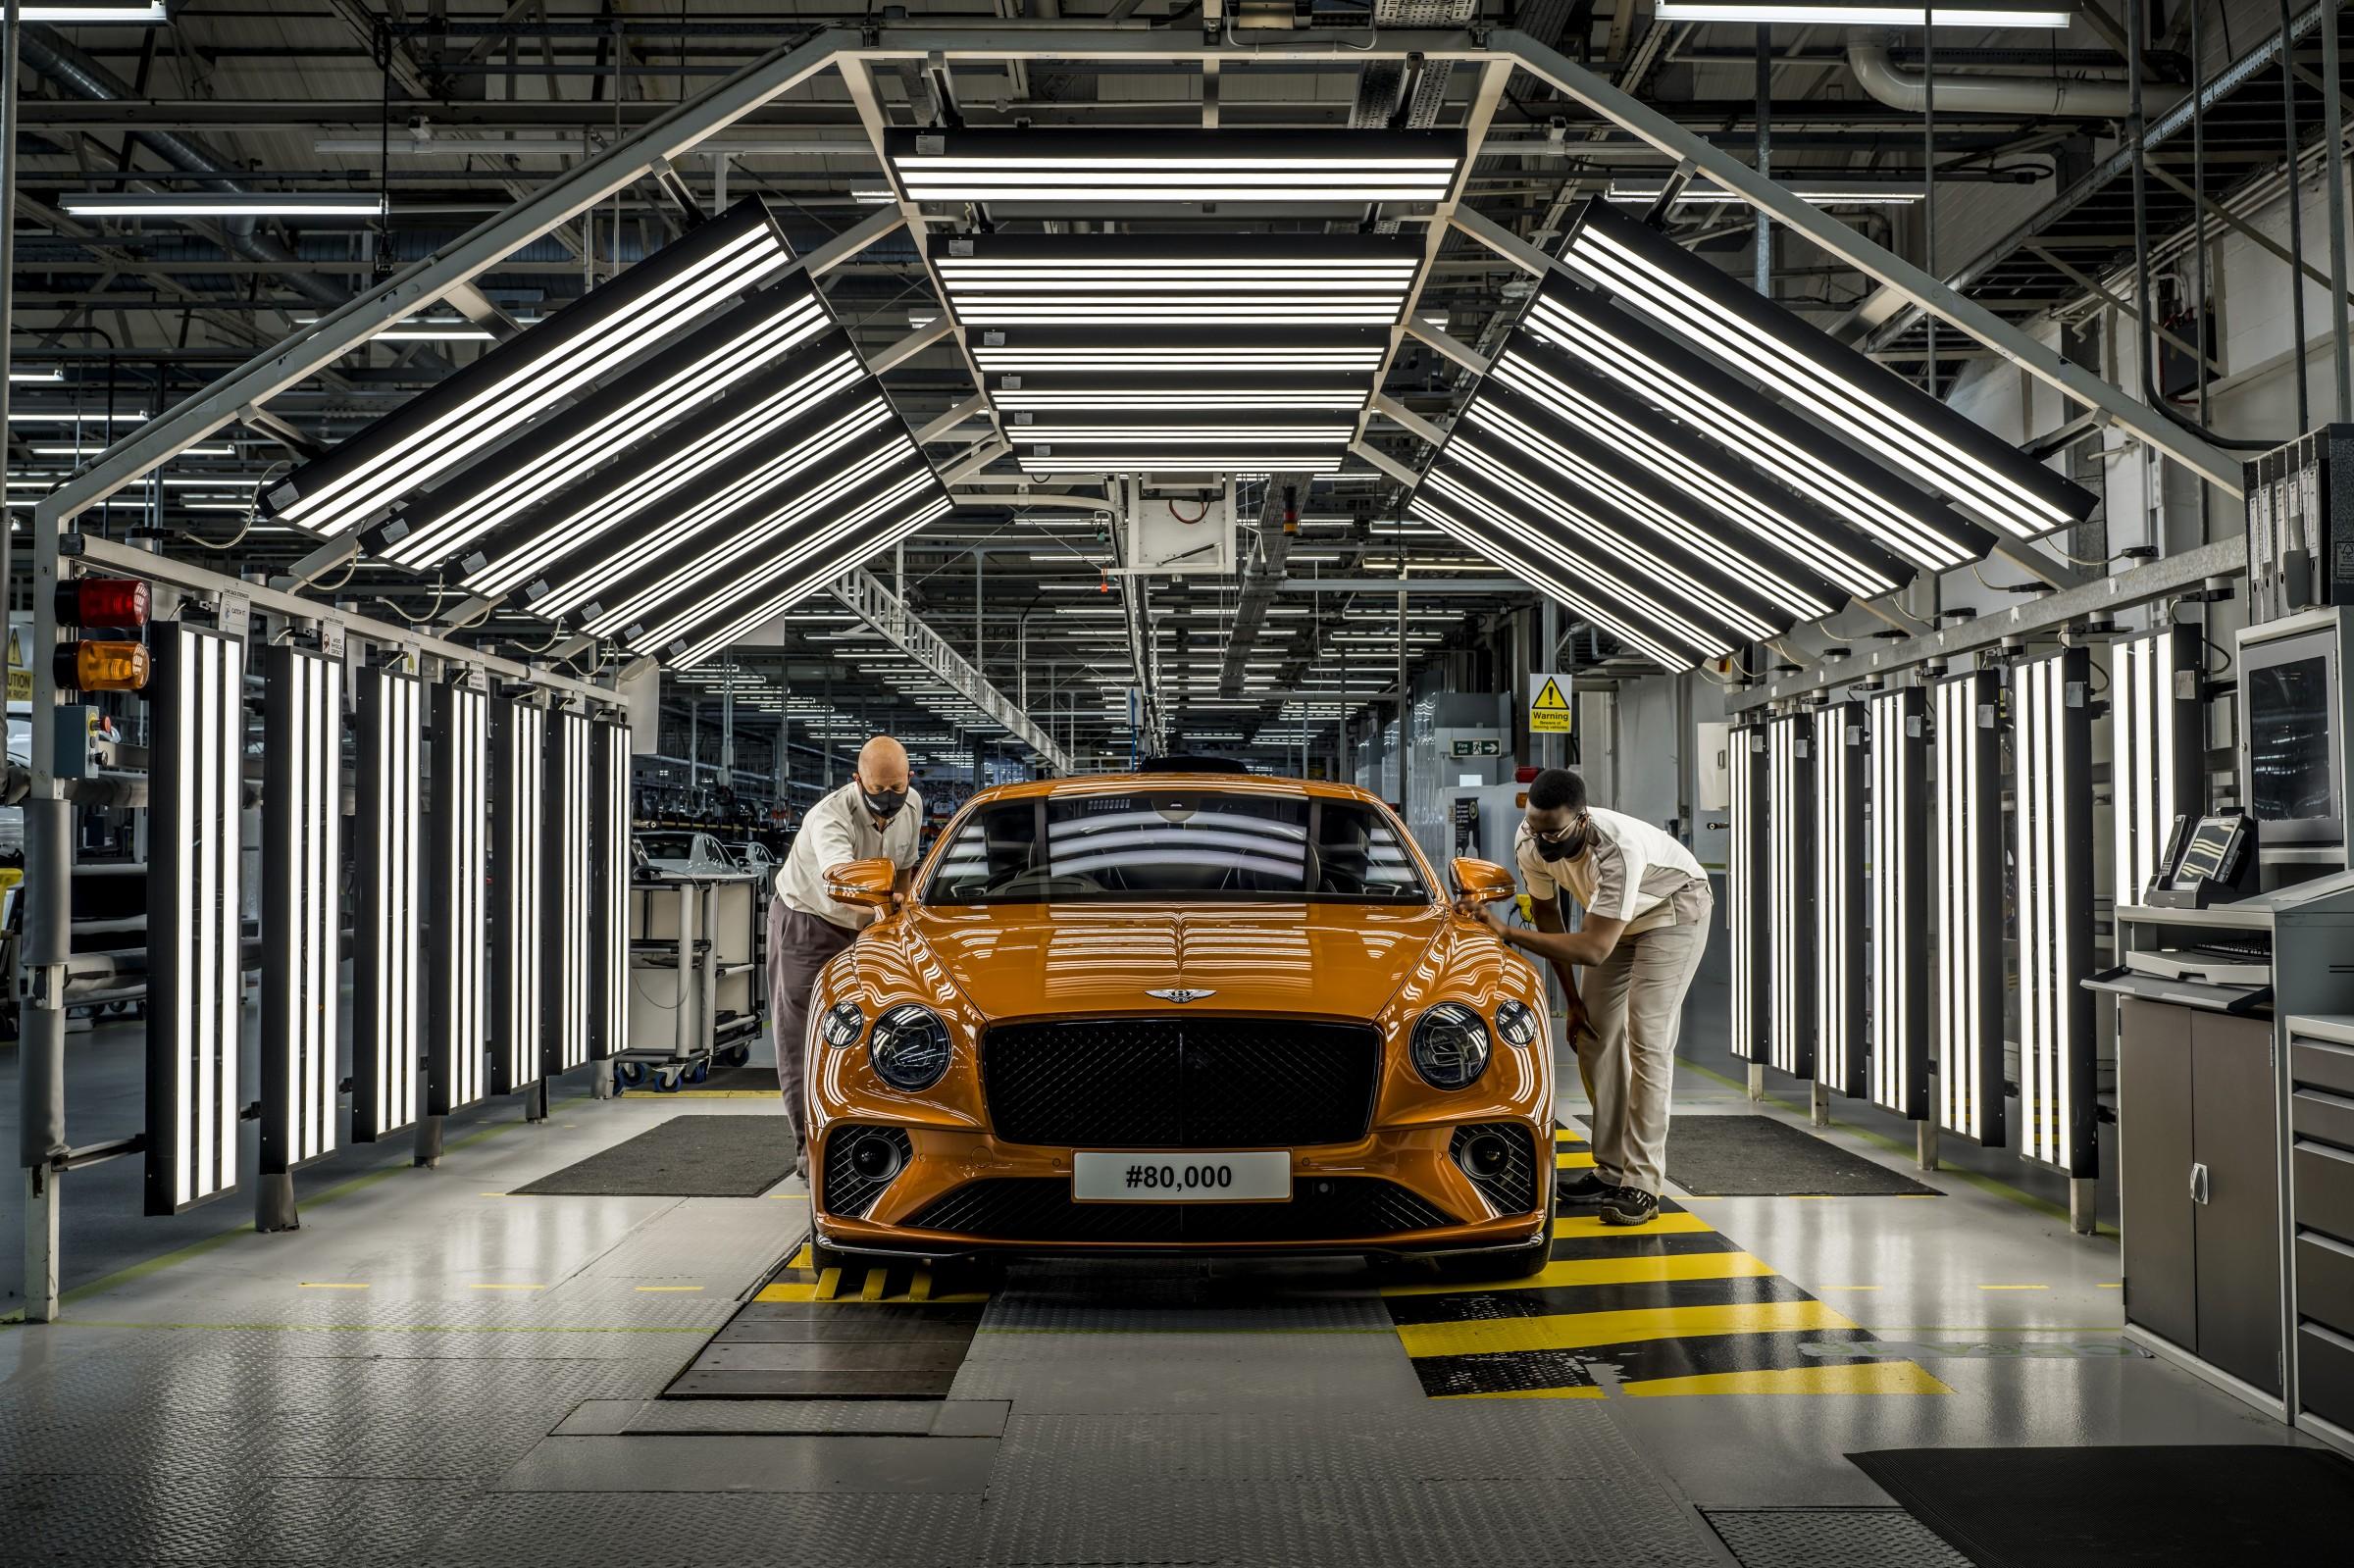 price of 2021 Bentley Continental GT in Nigeria